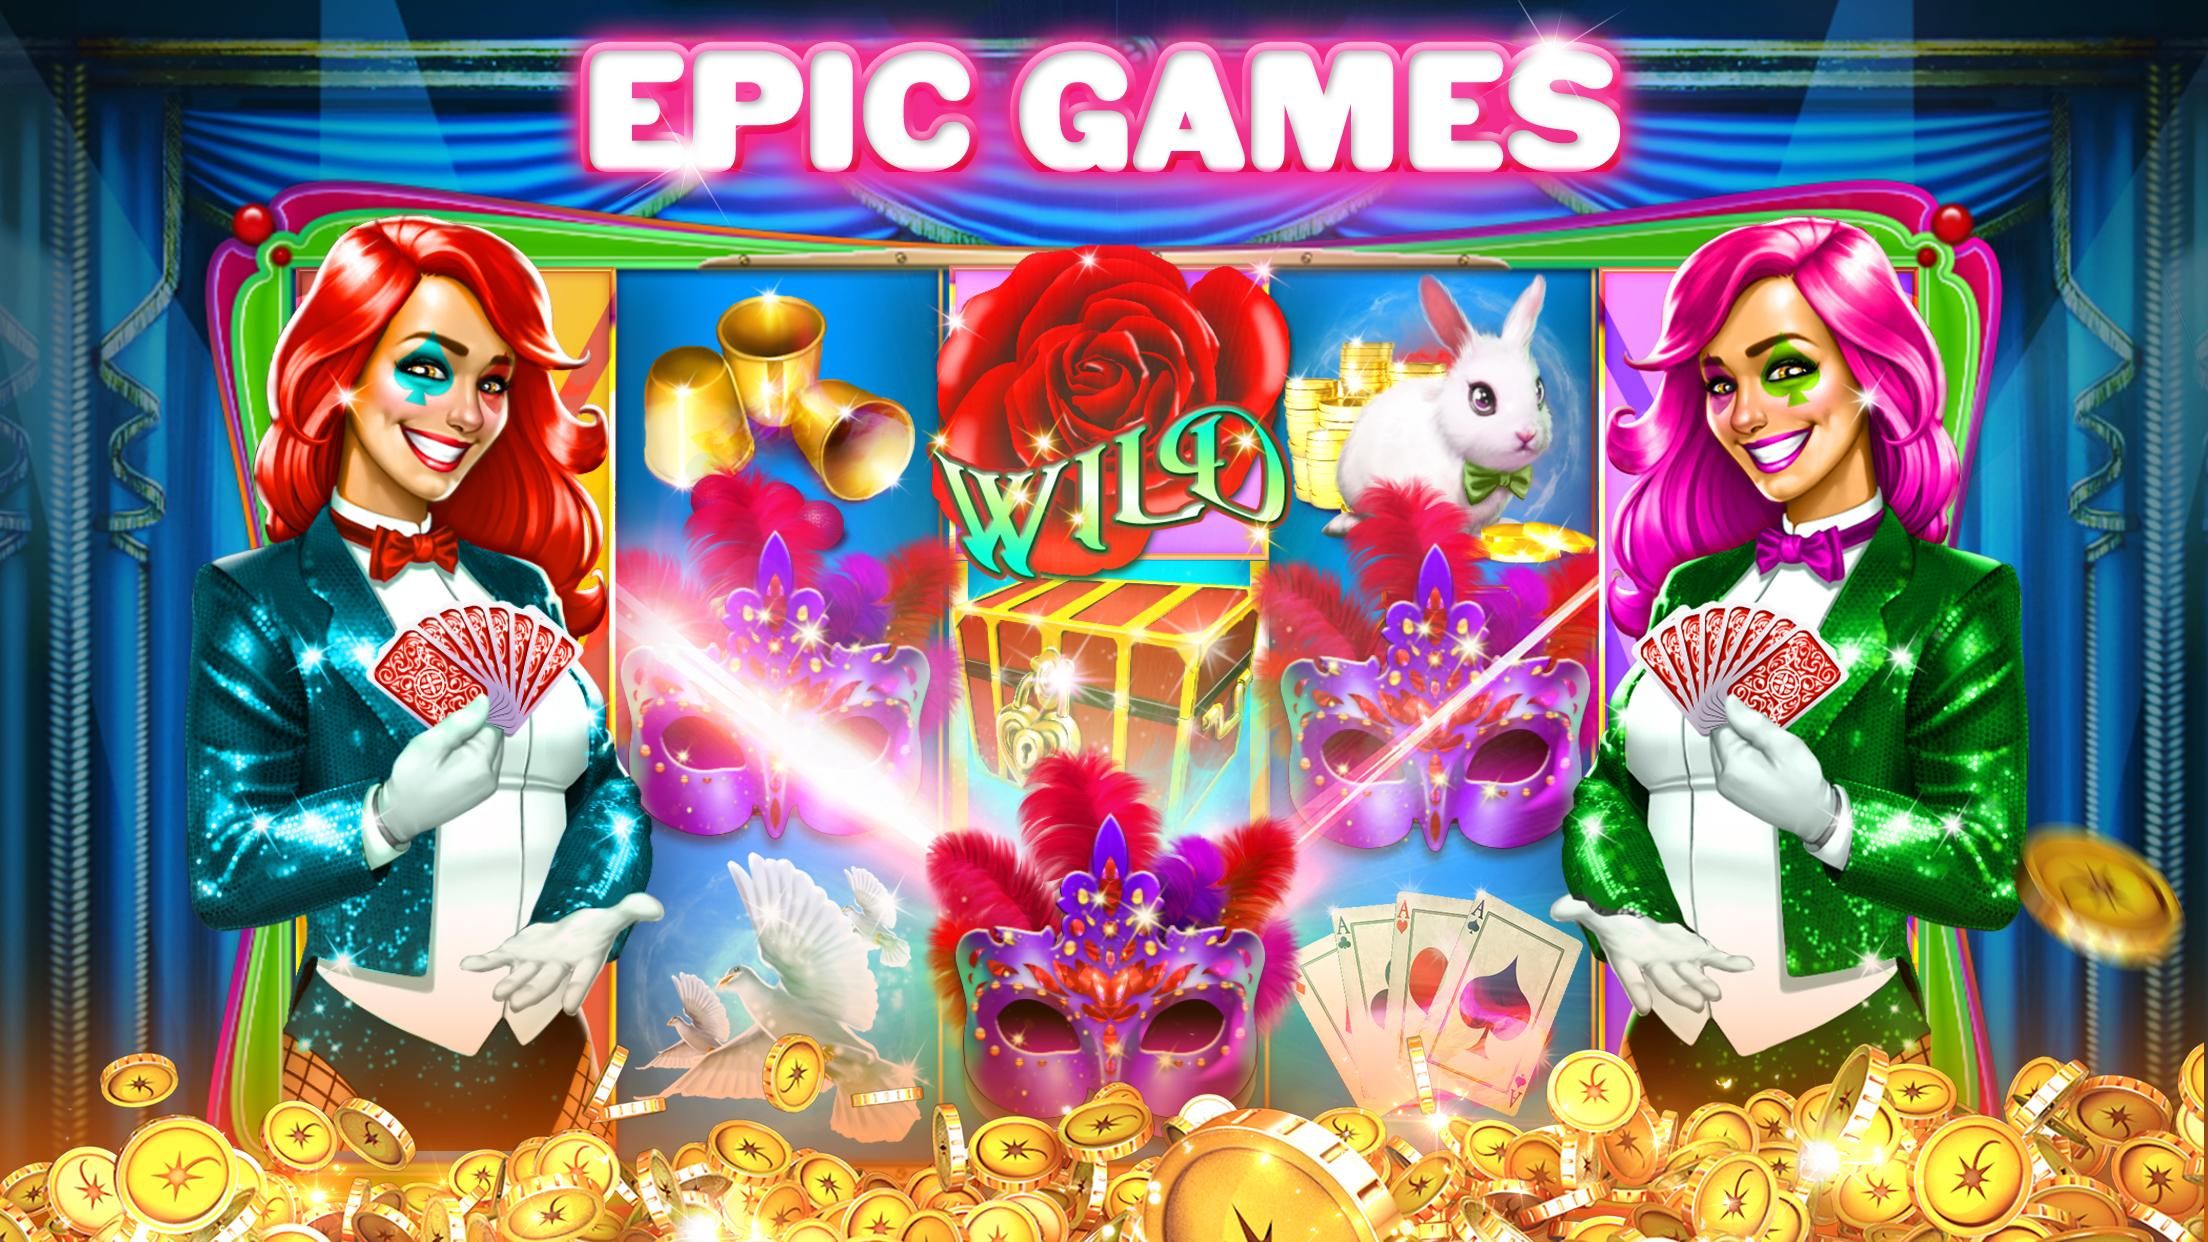 Jackpotjoy Slots Slot machines with Bonus Games 26.0.05 Screenshot 3